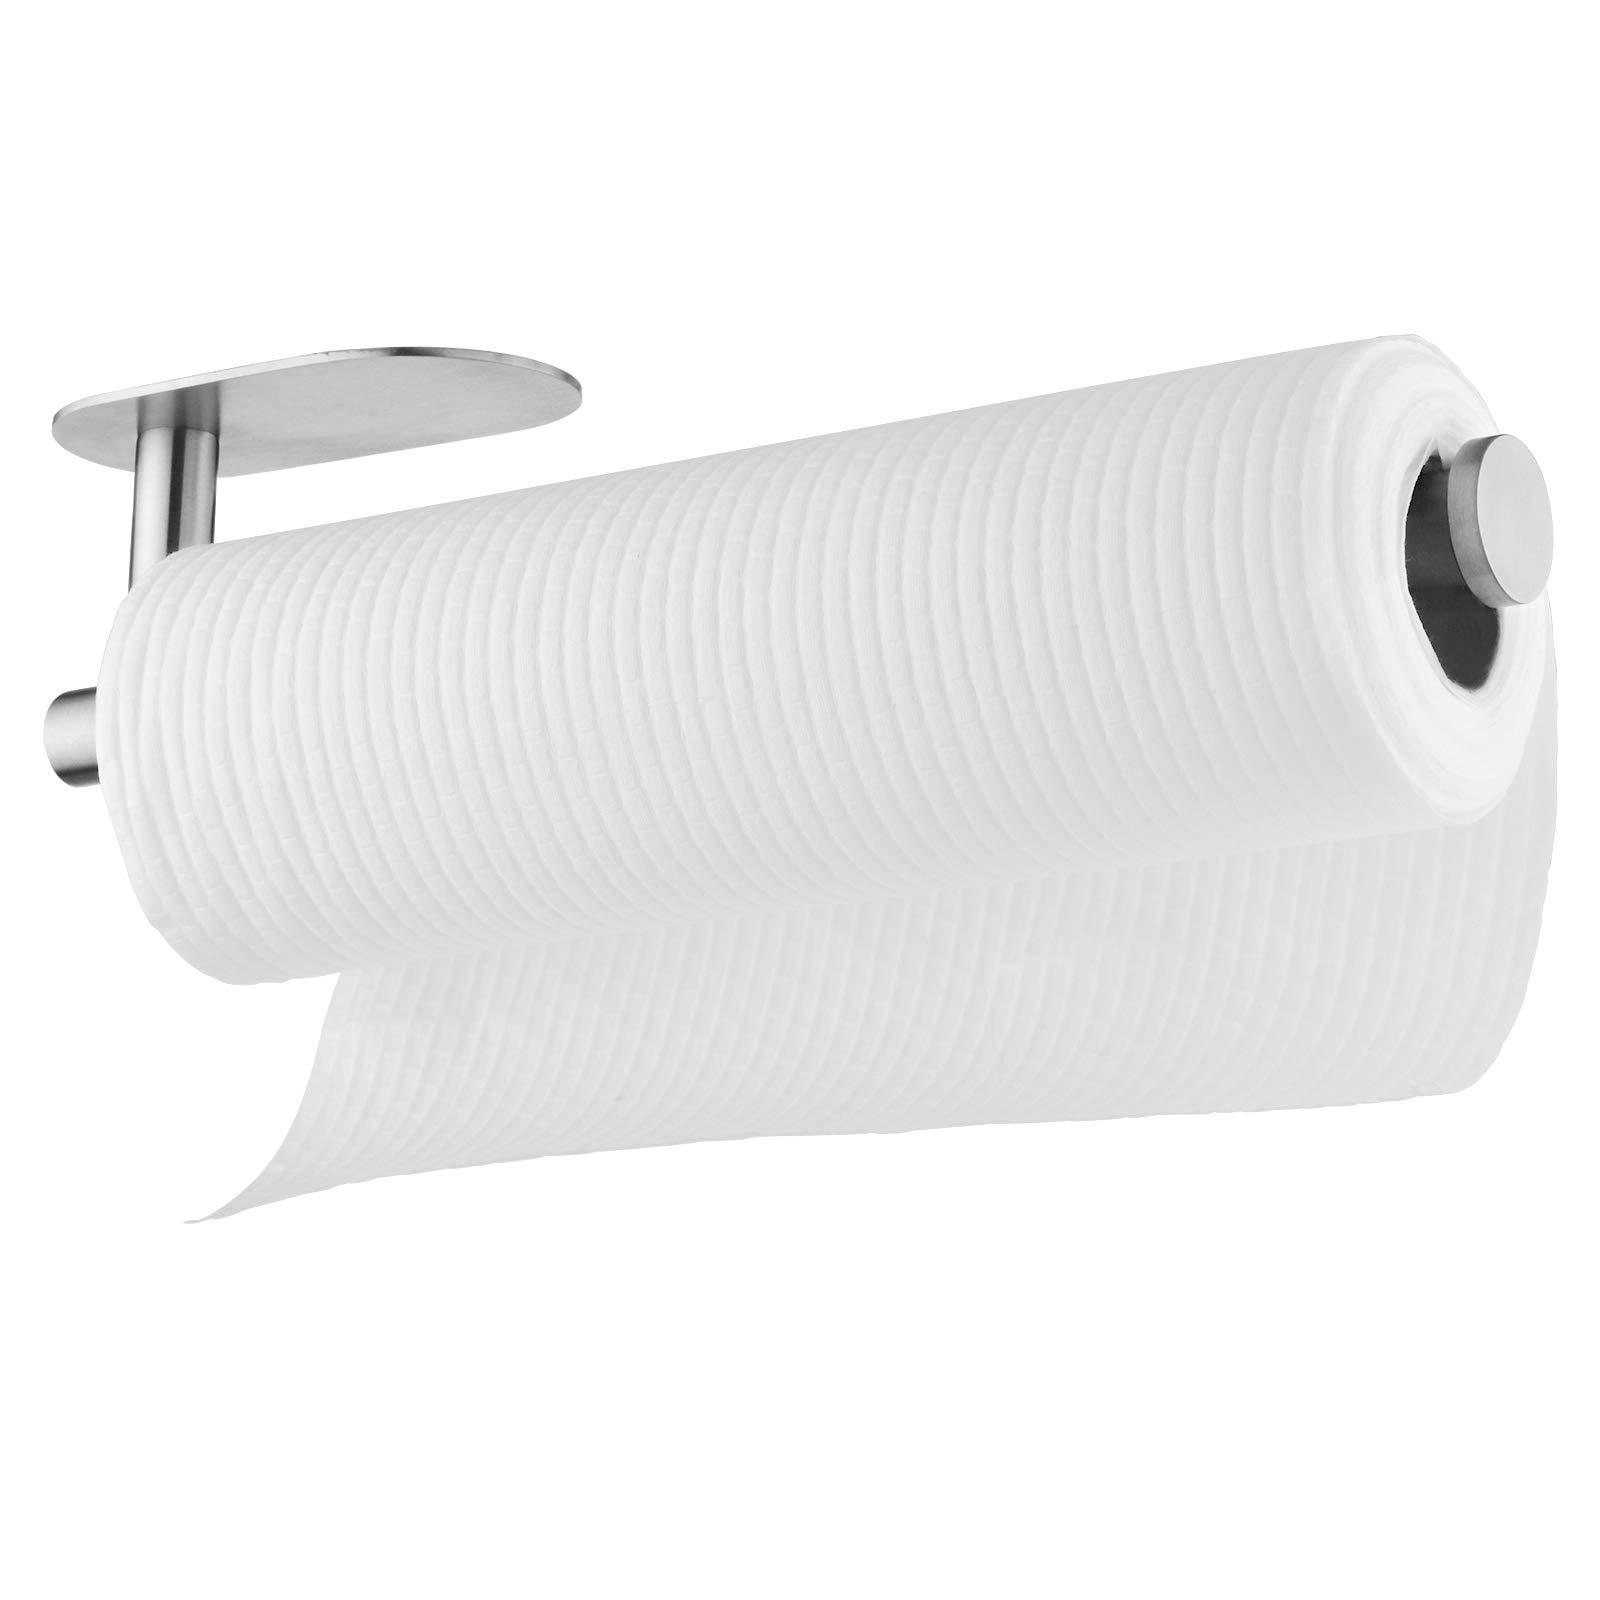 Paper Towel Holder Furnikko Self Adhesive Paper Towel Rack Under Kitchen Cabinet